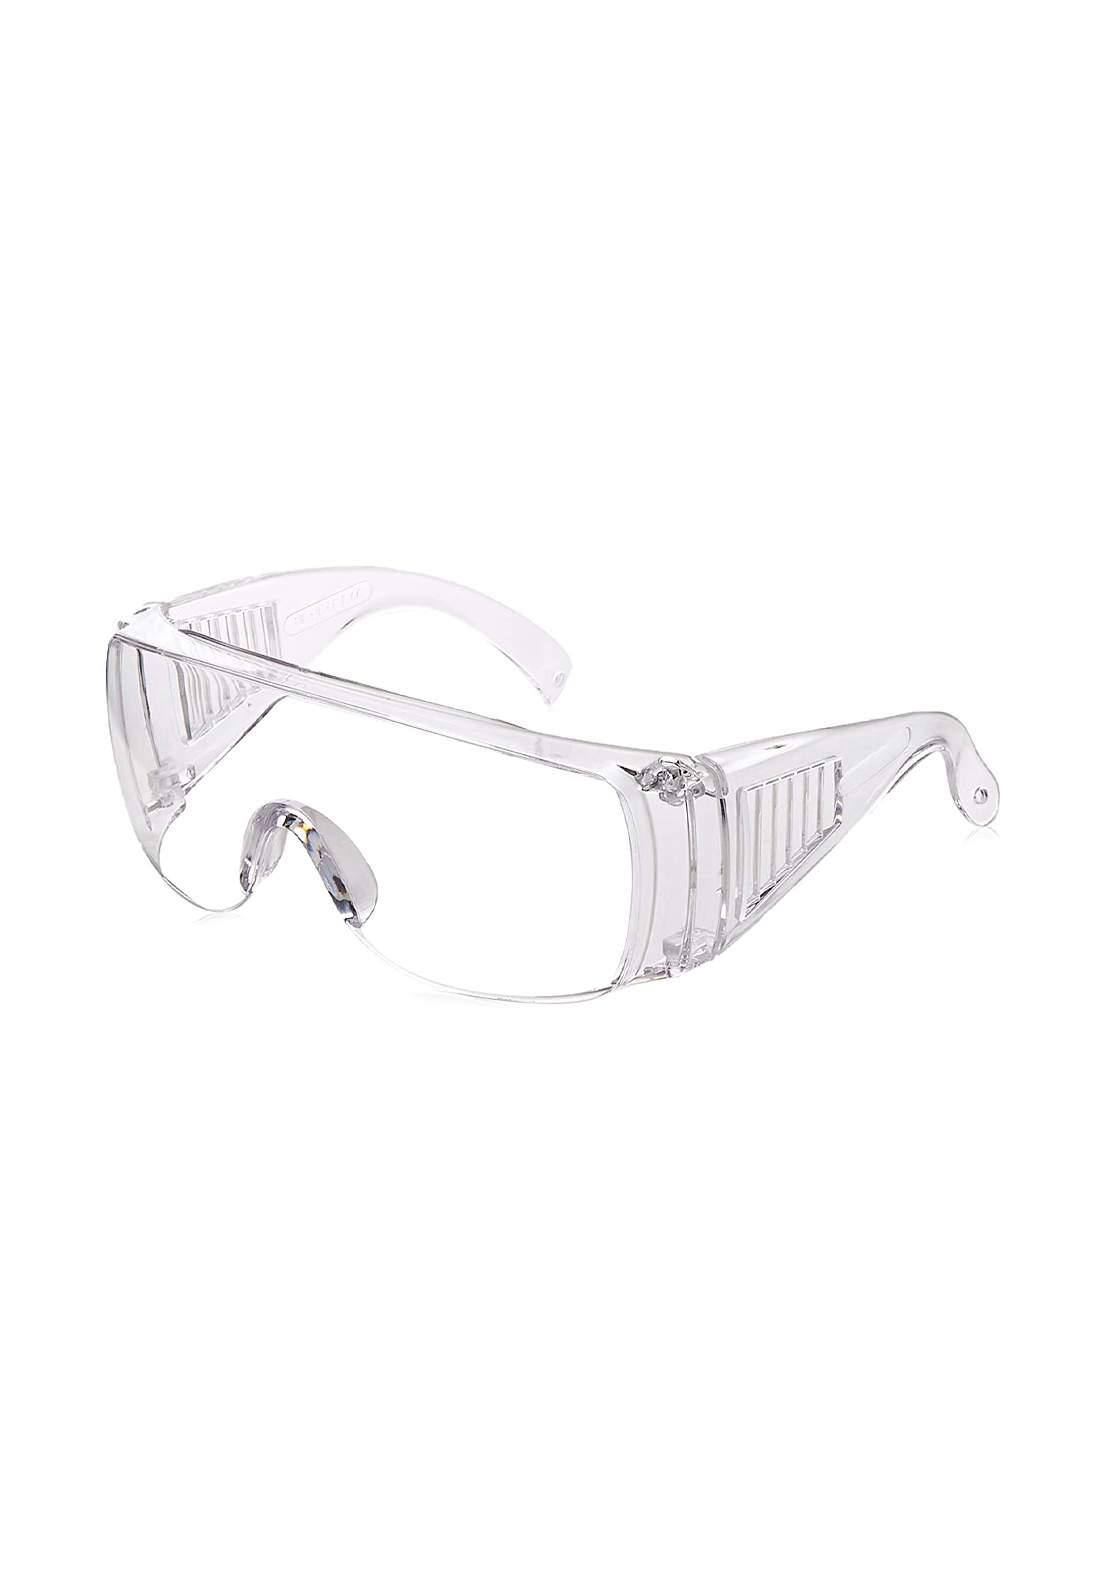 Subul AlHurra Safety Glasses And Eye Protection نظارات أمان متعددة الوظائف